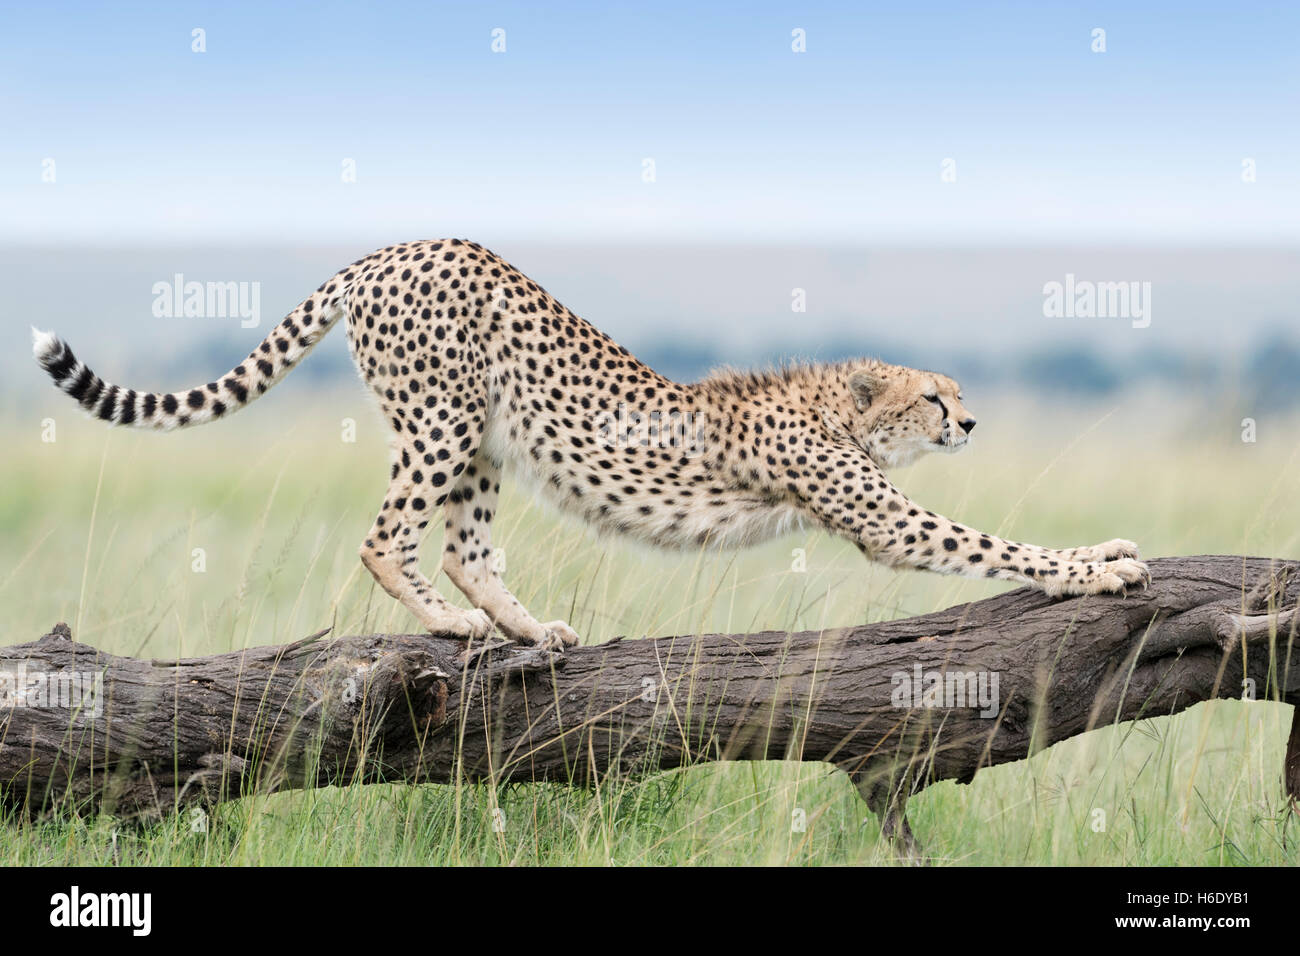 Gepard (Acinonix Jubatus) erstreckt sich auf umgestürzten Baum, Masai Mara National Reserve, Kenia Stockbild